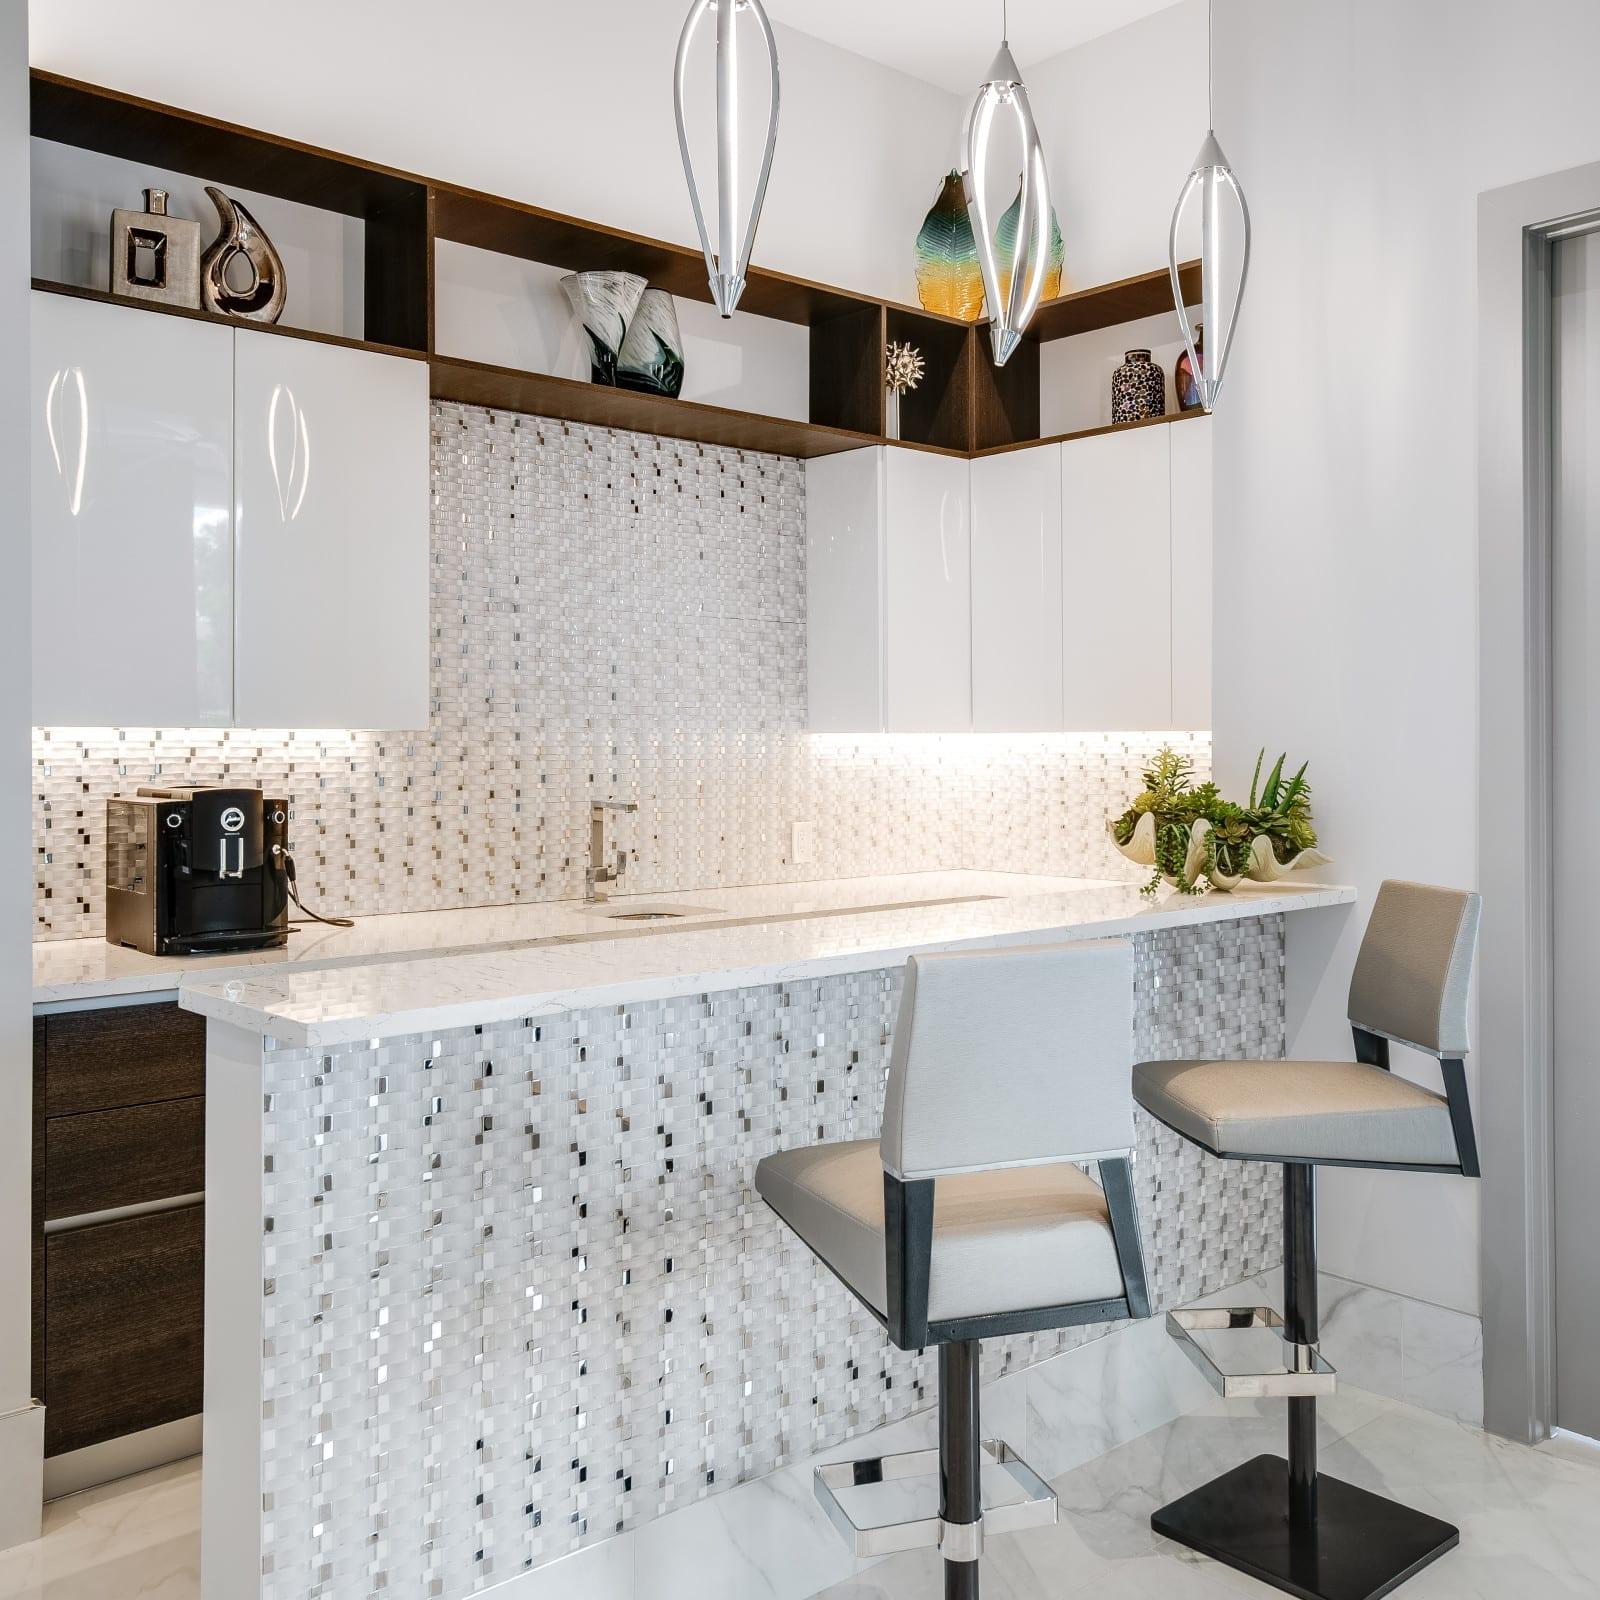 Custom Home Build and Interior Design # 34 - Millennial Design + Build, Home Builders in Dallas Texas, modern style homes, and custom home builders in DFW